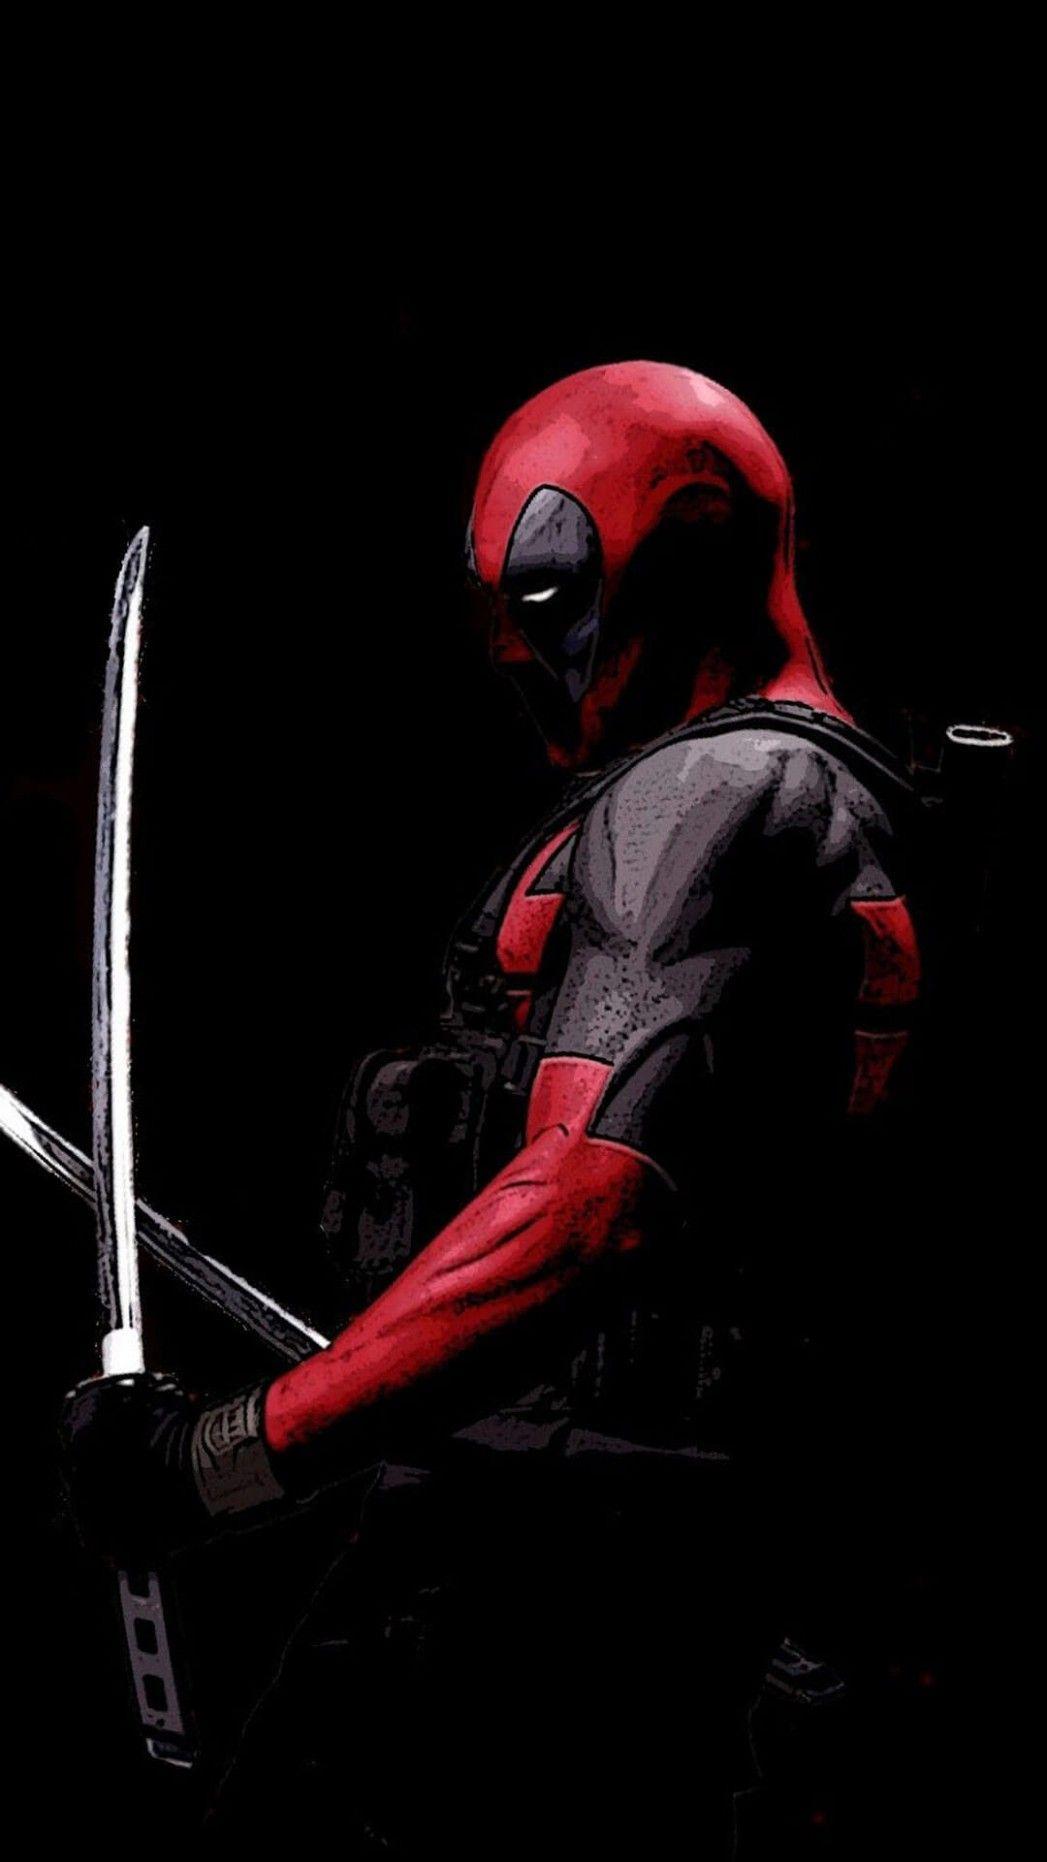 Badass Deadpool Wallpaper posted by ...